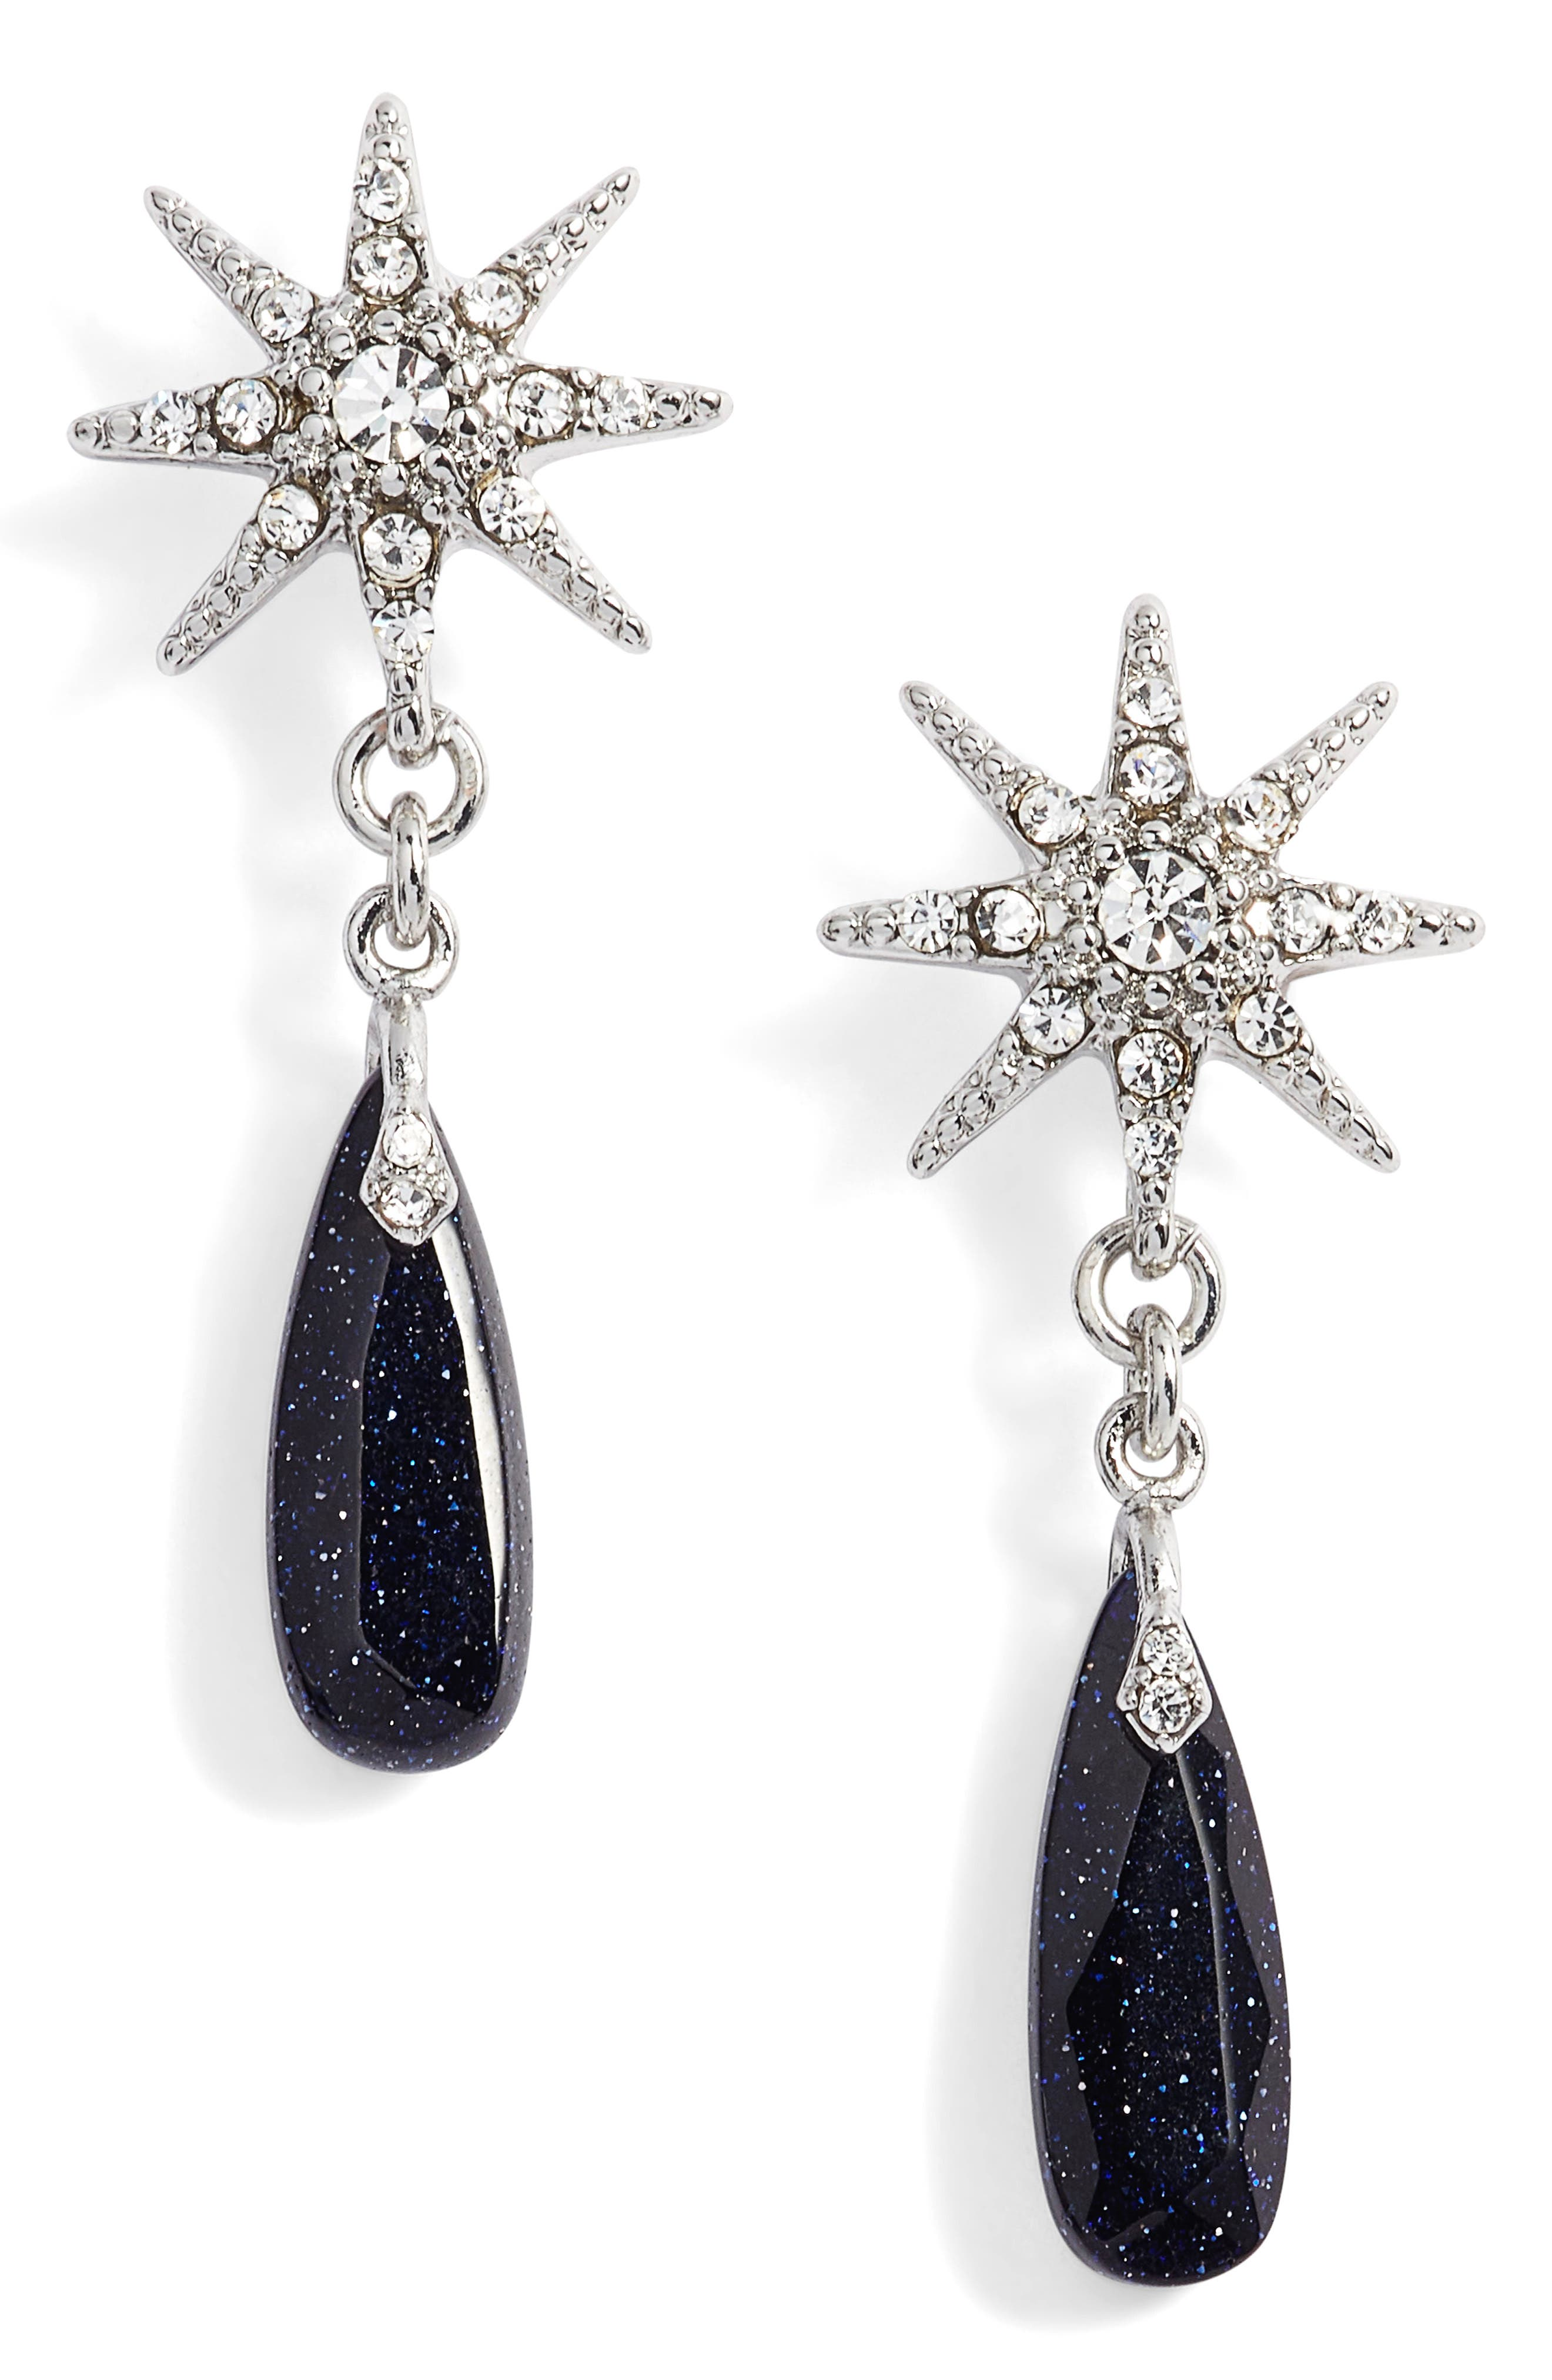 Main Image - Jenny Packham Imitation Pearl Drop Earrings